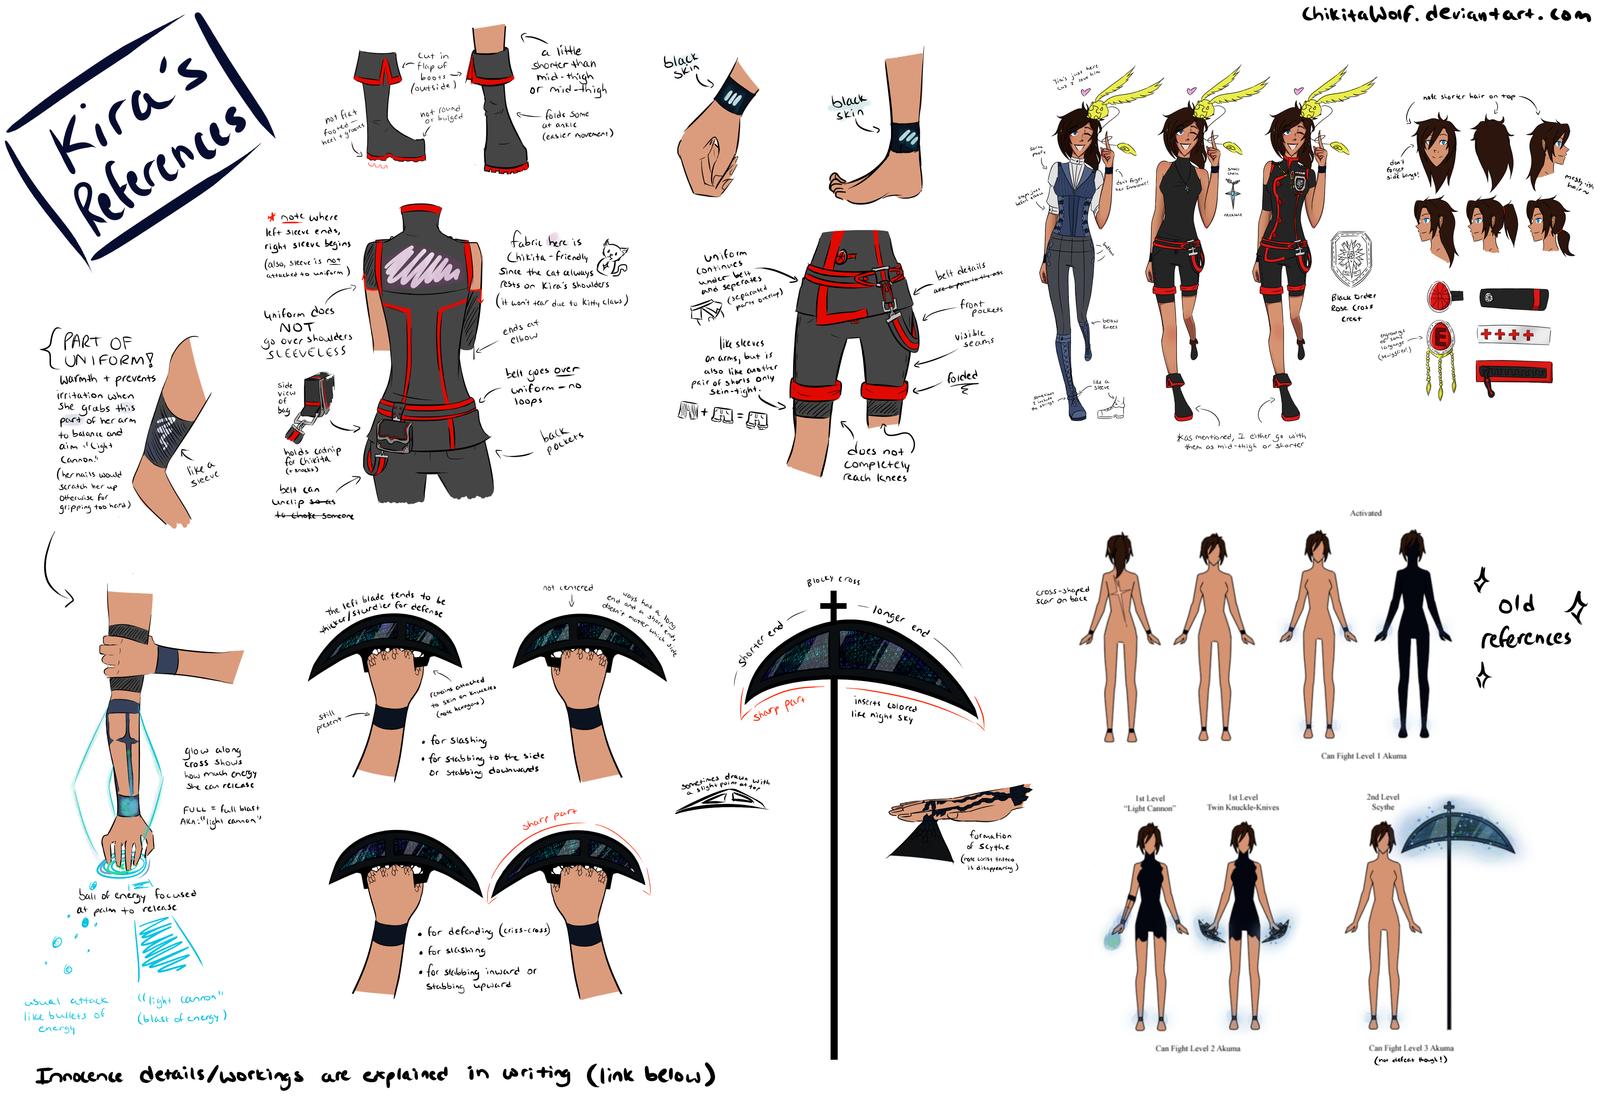 Kira Renee Malcolm: Full Reference by ChikitaWolf on DeviantArt